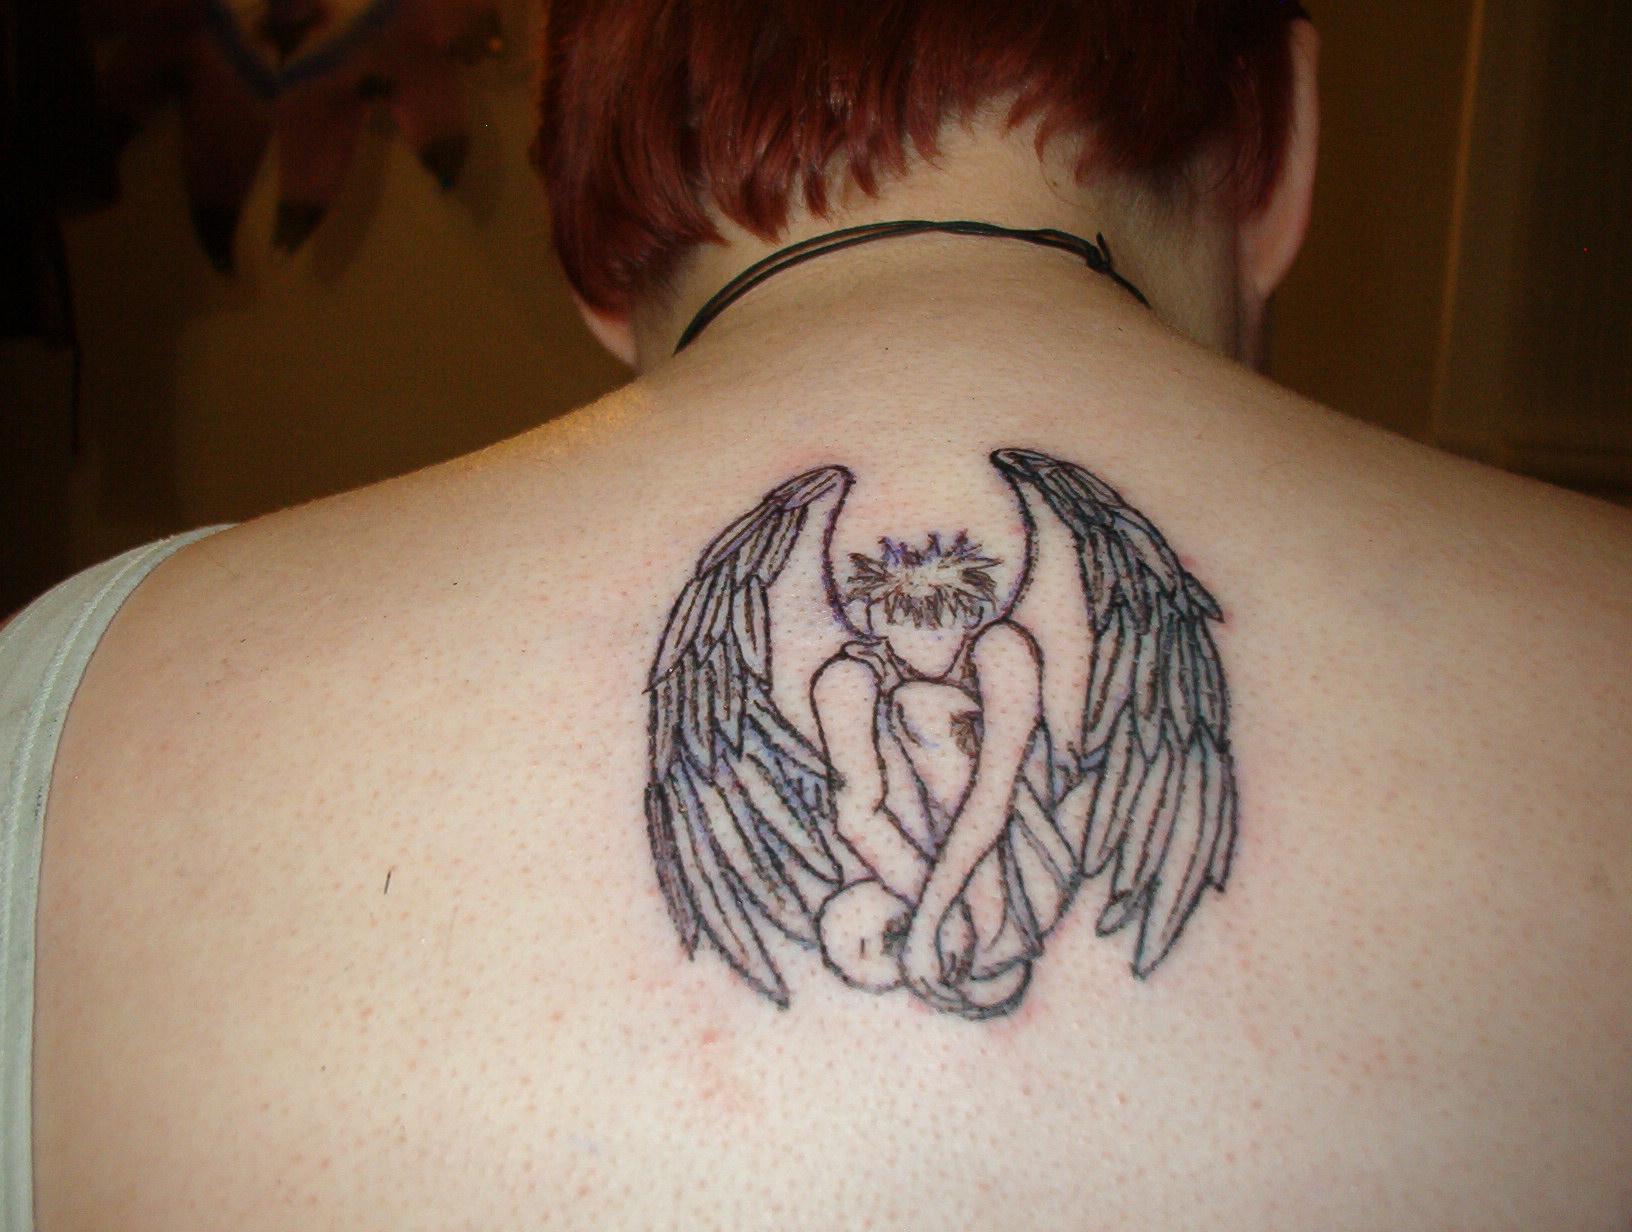 Kat's Angel